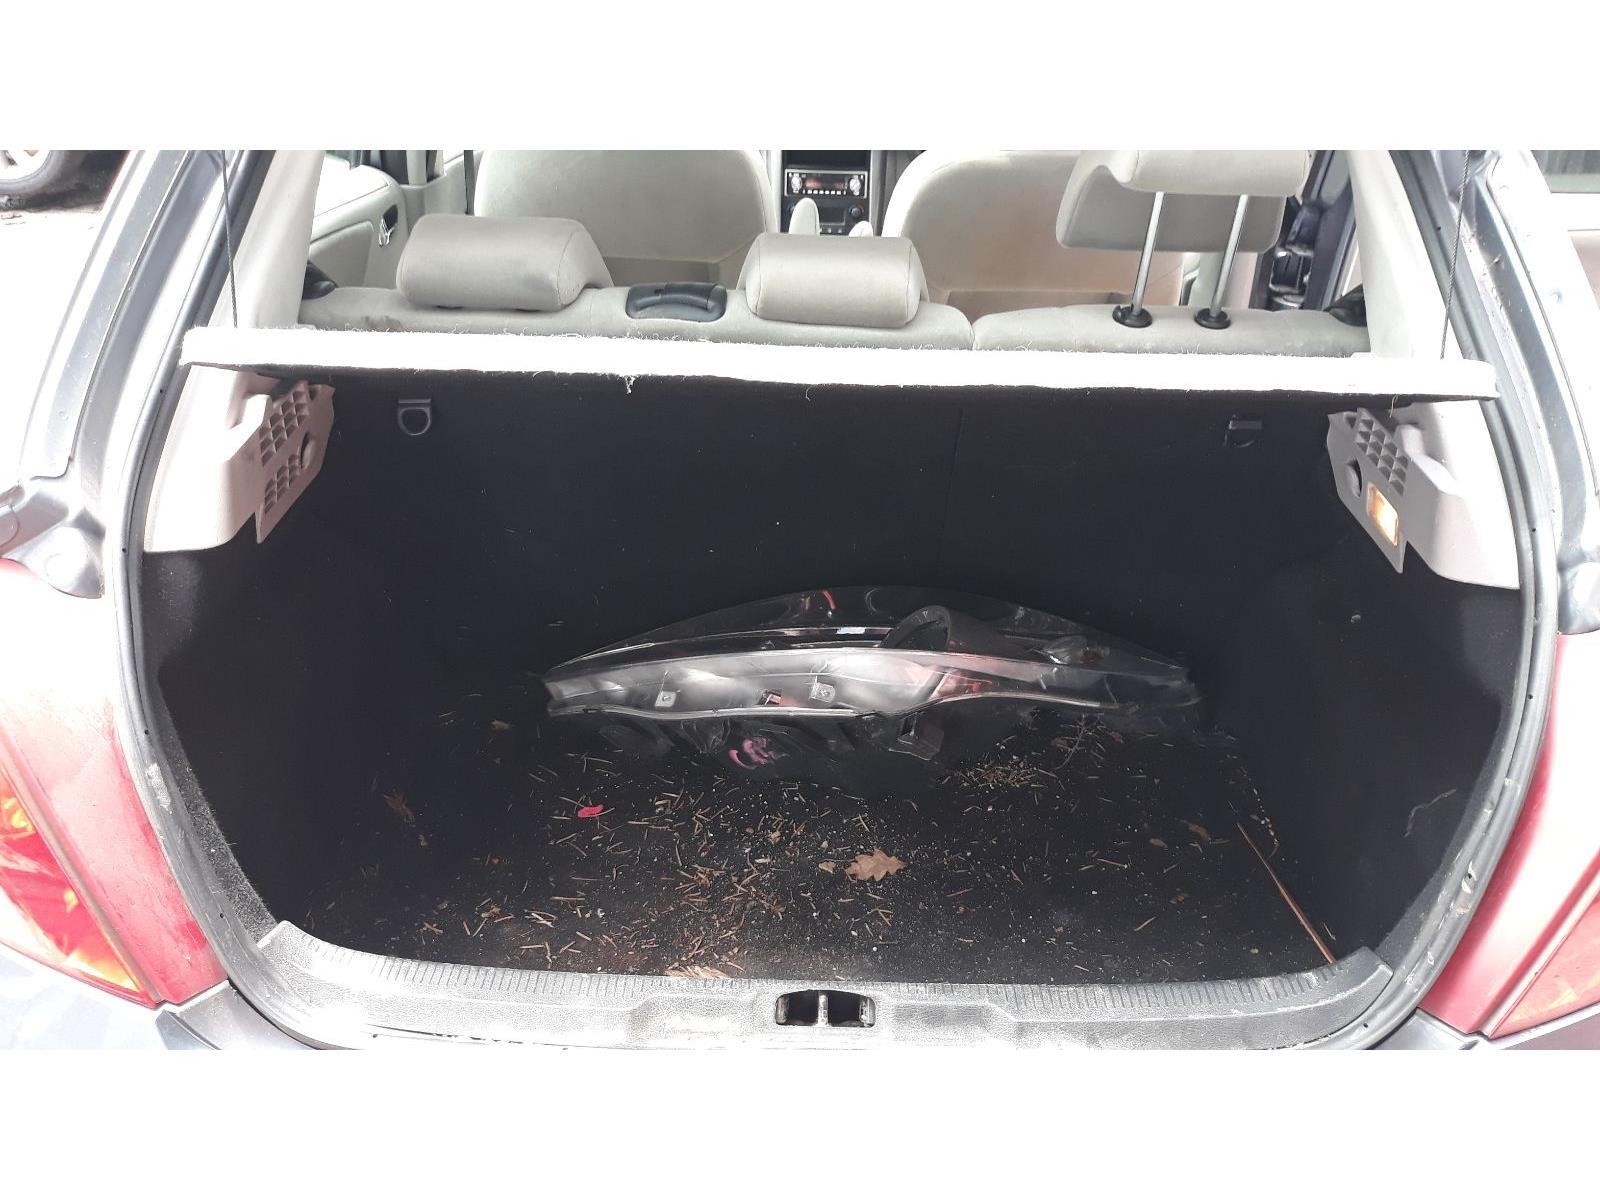 Peugeot 207 2006 To 2009 Se 5 Door Hatchback Scrap Salvage Car 306 Fuse Box Brake Lights Year